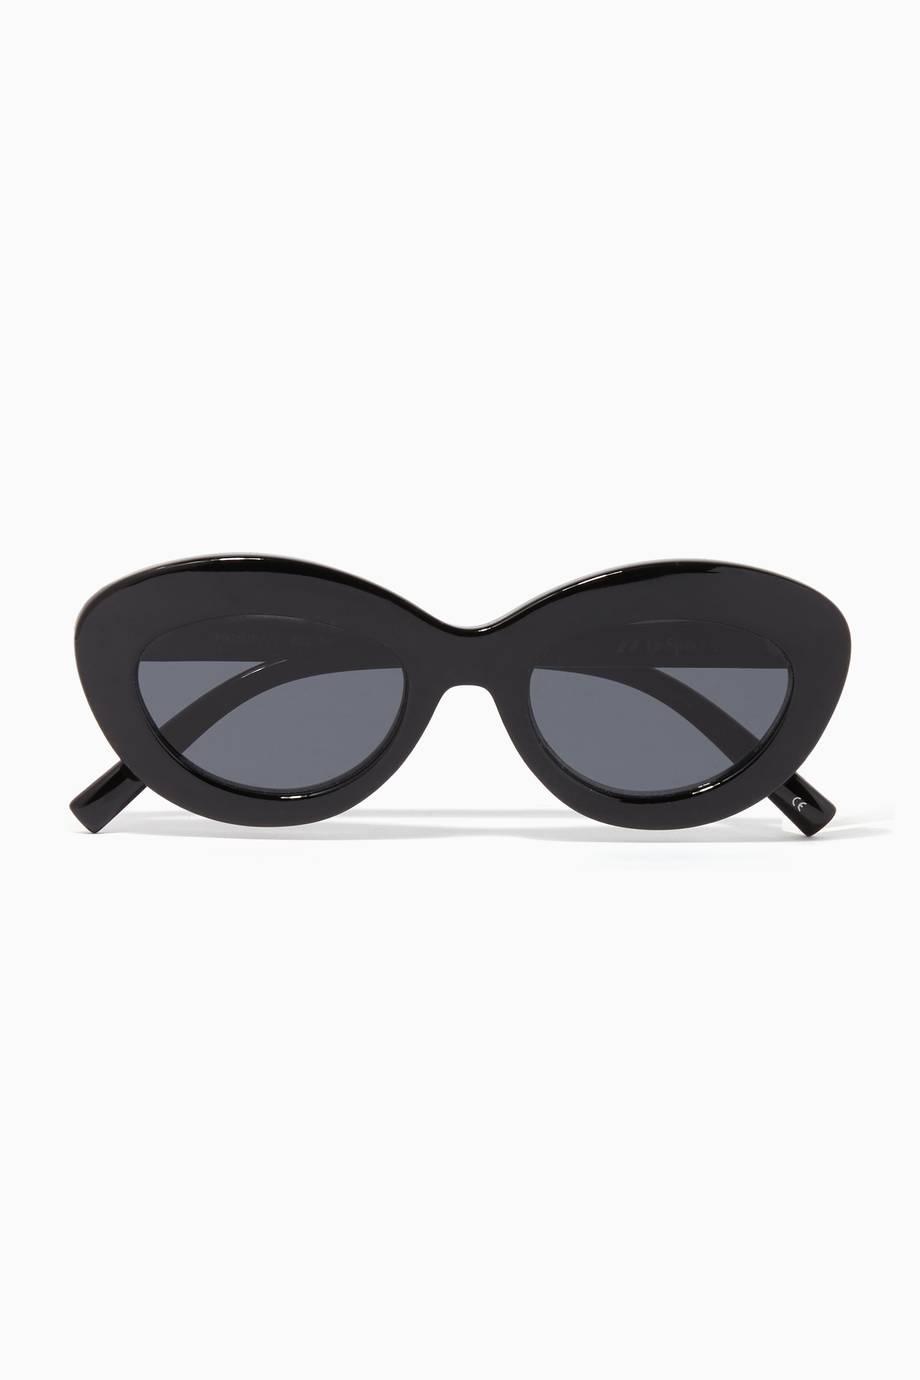 fbee7ca800 Shop Luxury Le Specs Black   Smoke Fluxus Sunglasses